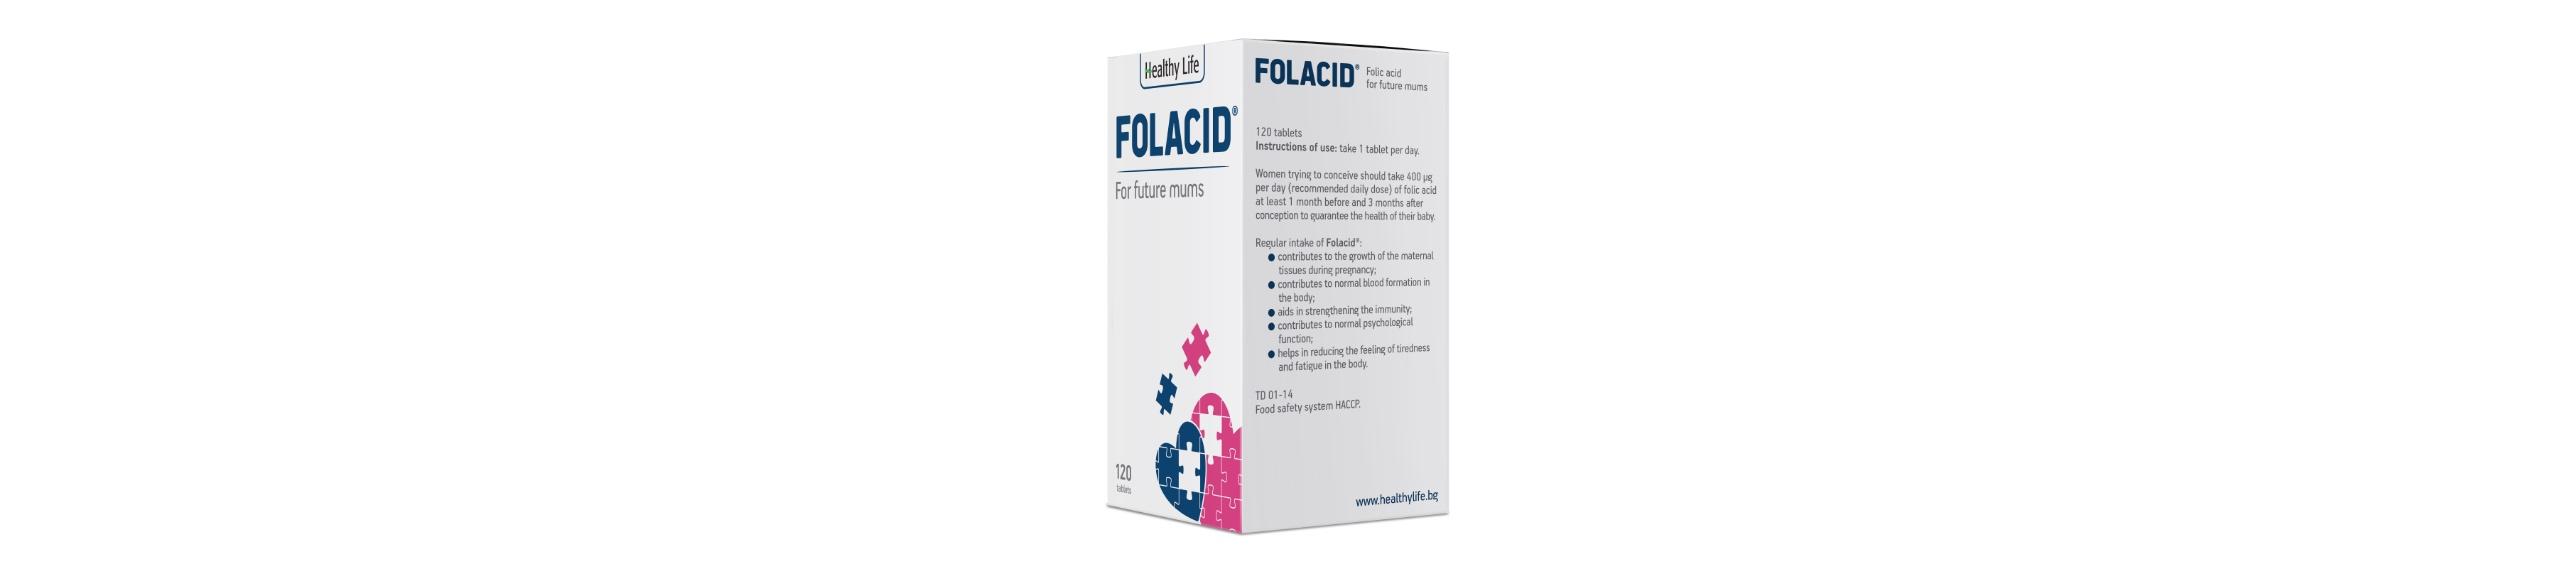 P3-Slider-img-FolacidM3